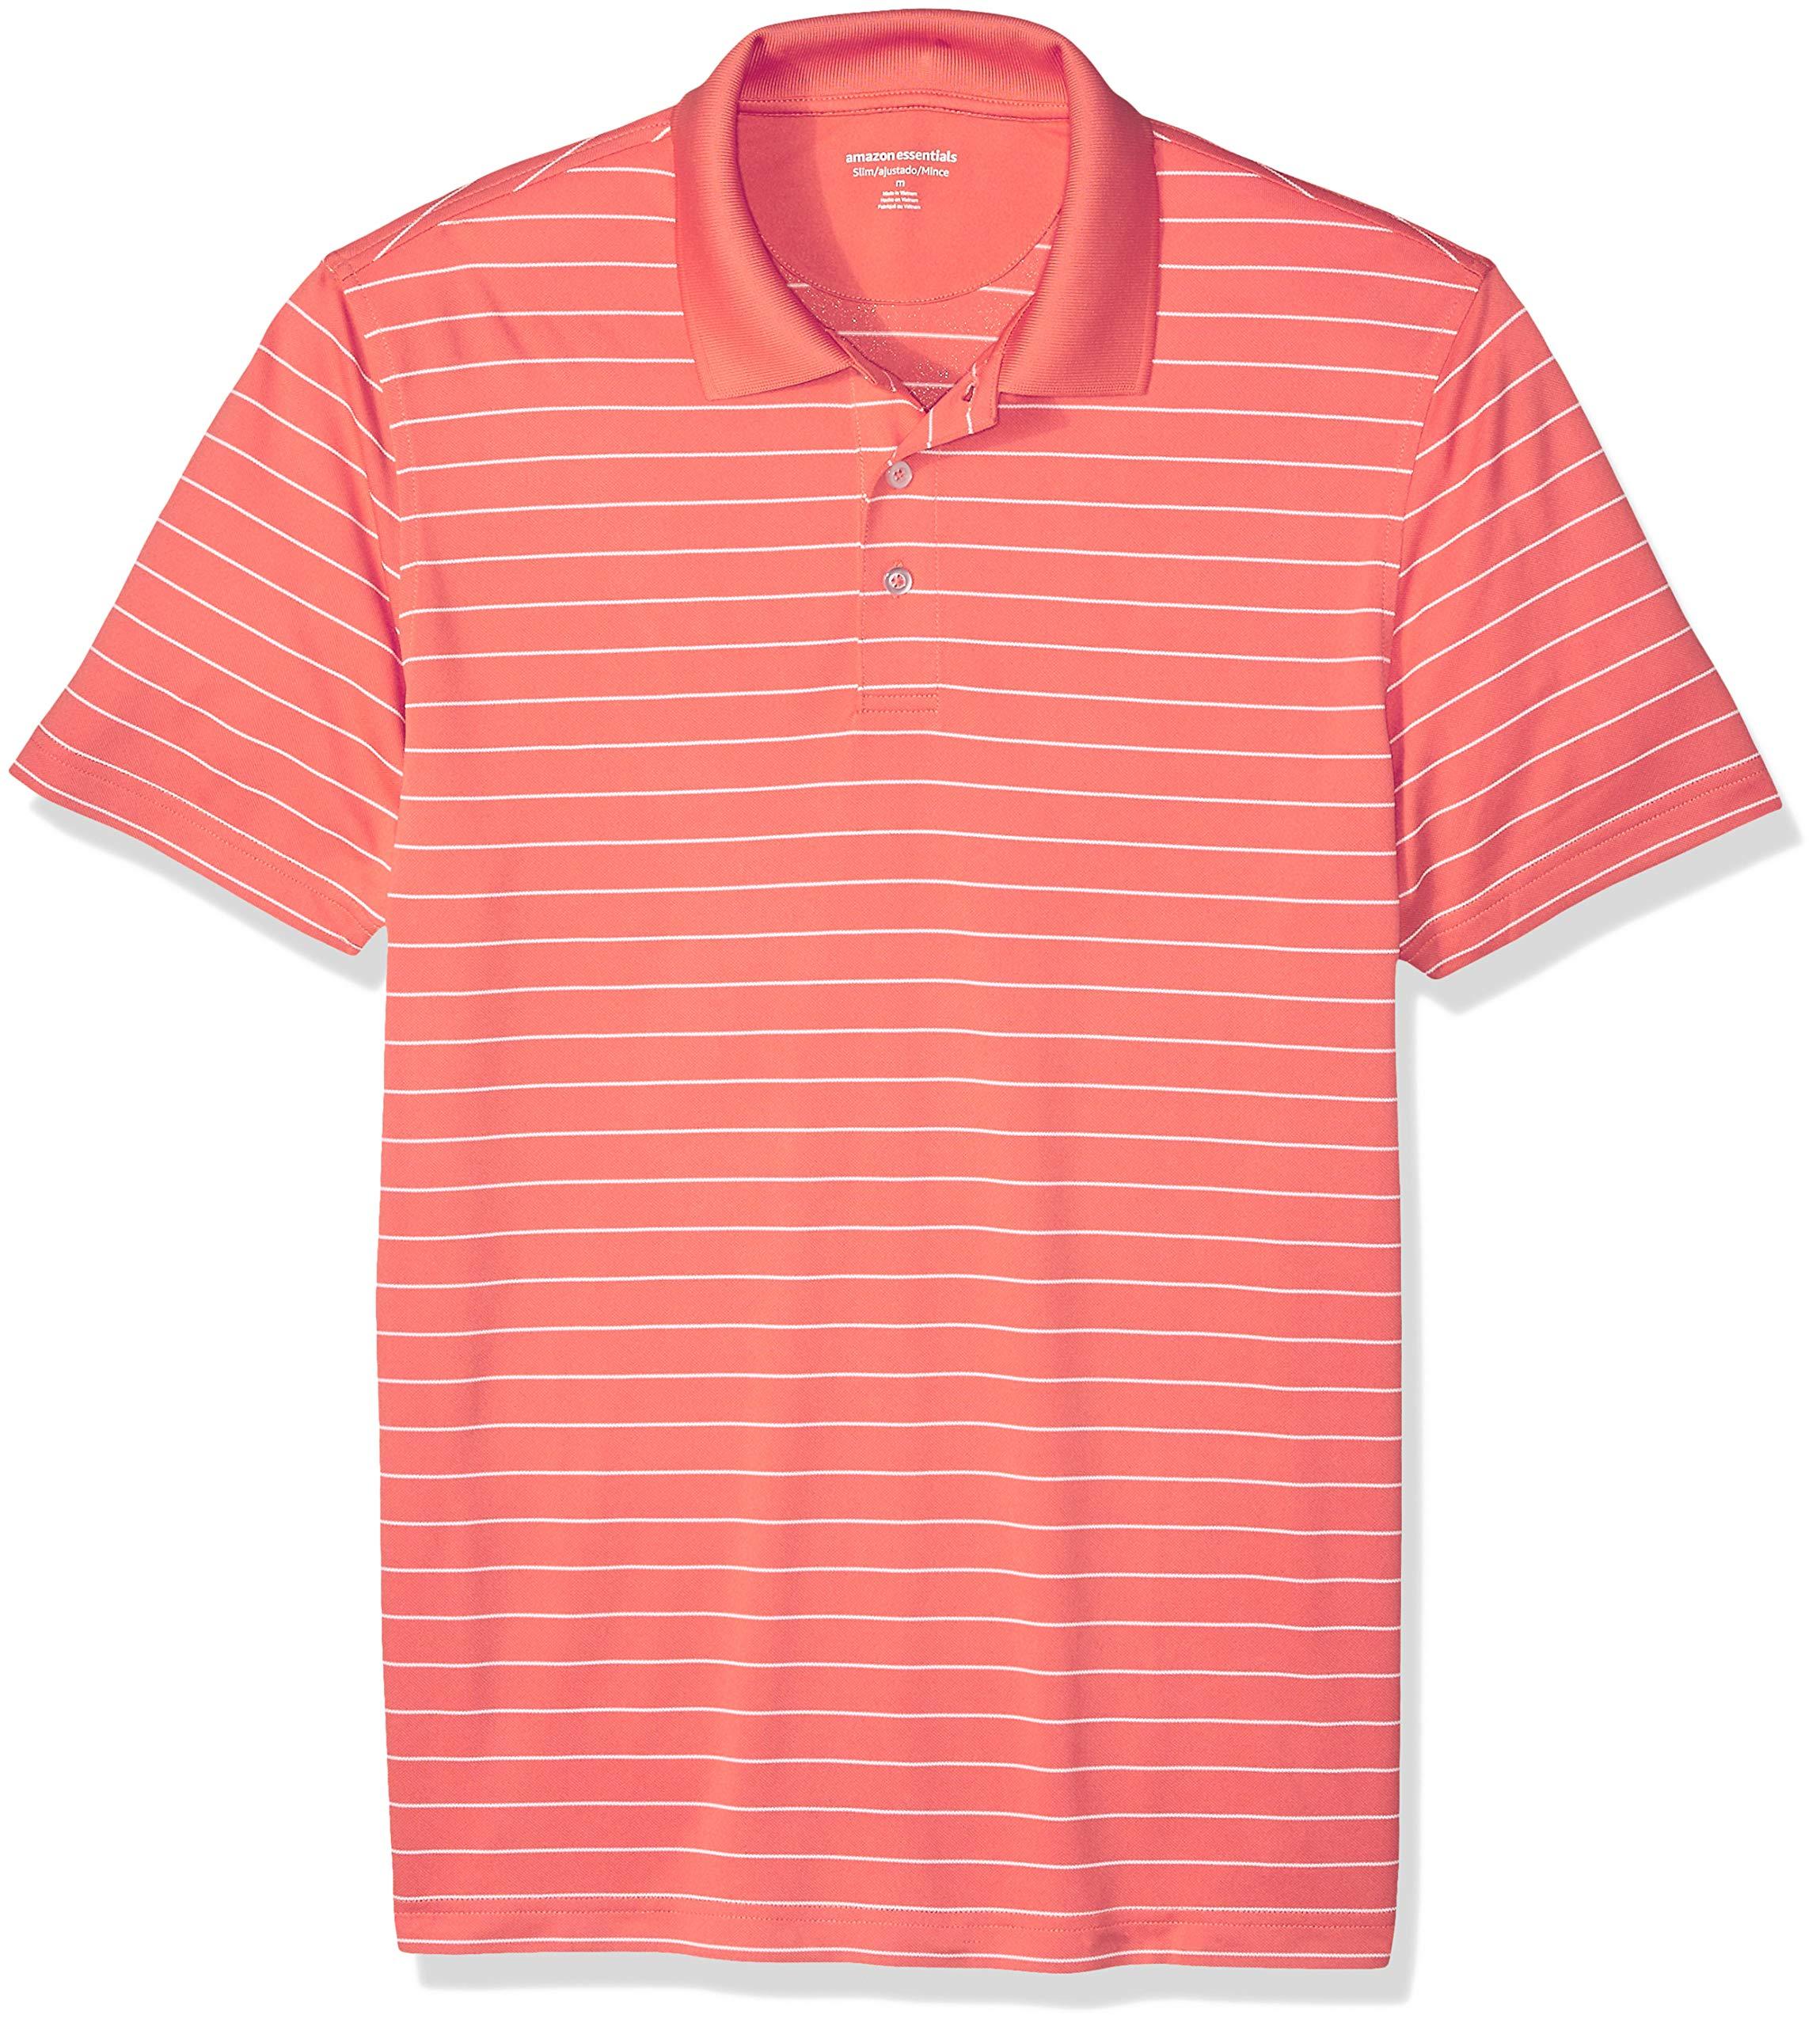 Amazon Essentials Men's Slim-Fit Quick-Dry Golf Polo Shirt, Coral Stripe, X-Small